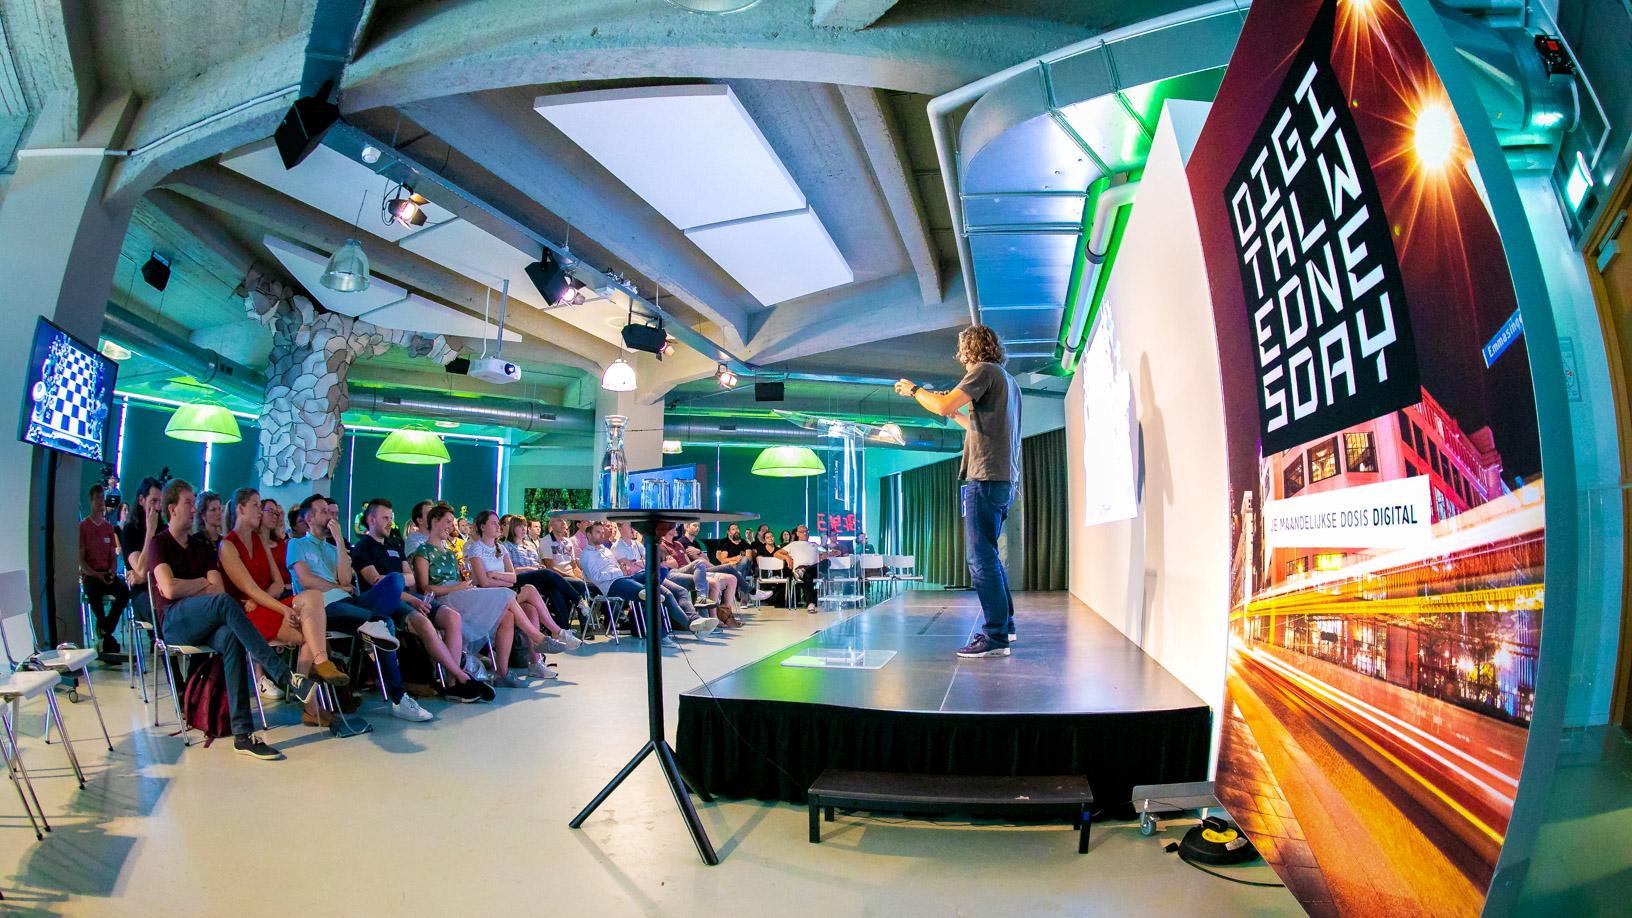 Portfolio-Marketing-Lynx-Ektor-Tsolodimos-Evenementen-fotografie-Eindhoven-27